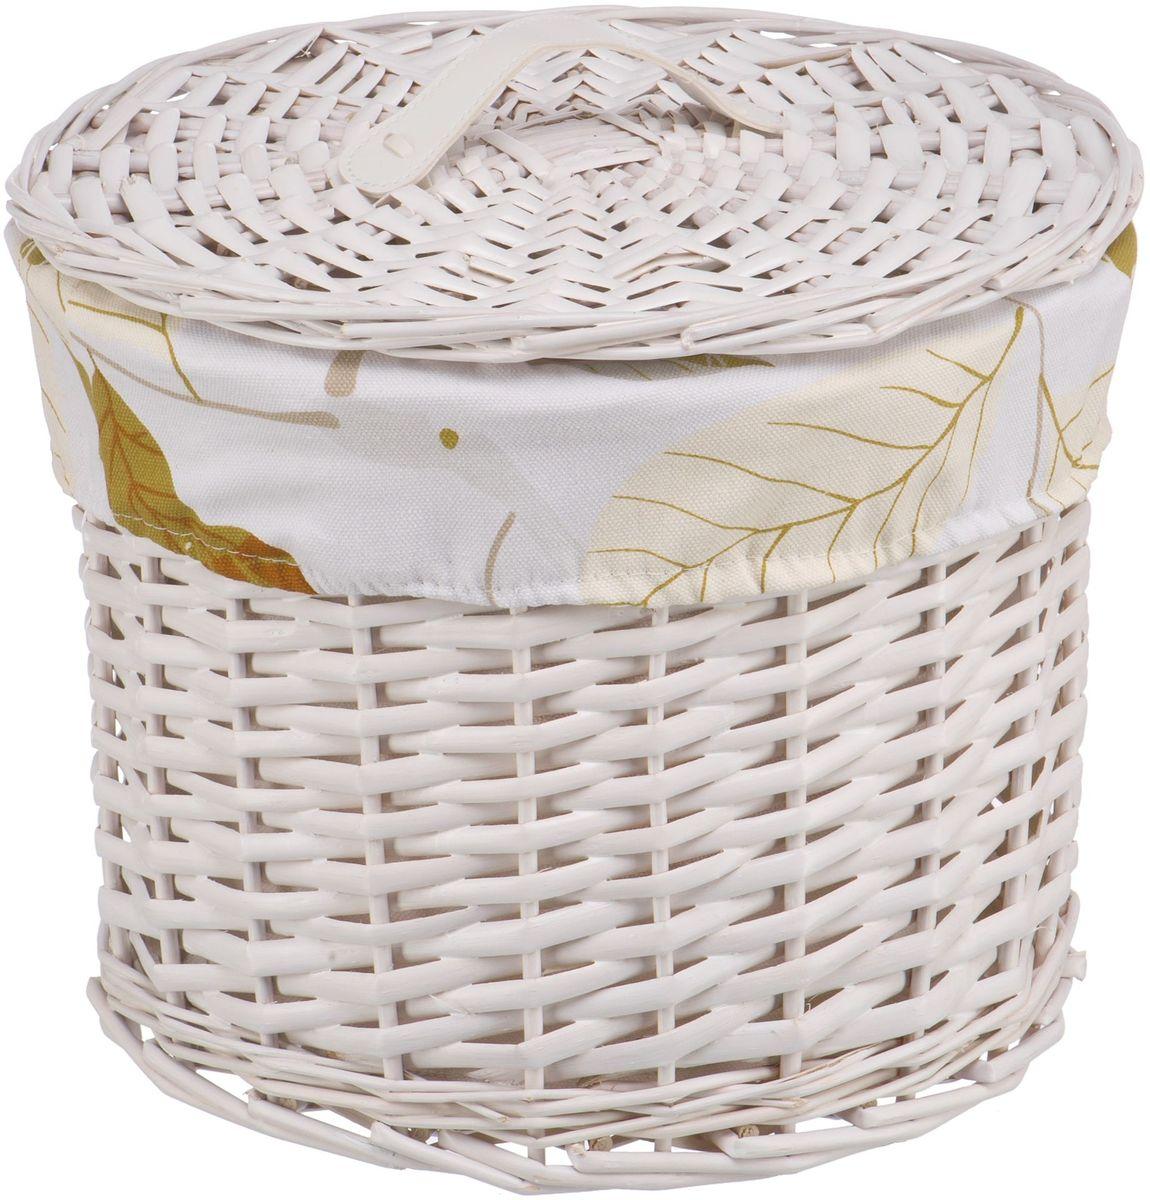 Корзина для белья Natural House  Листья , цвет: белый, 23 х 23 х 18 см - Корзины для белья